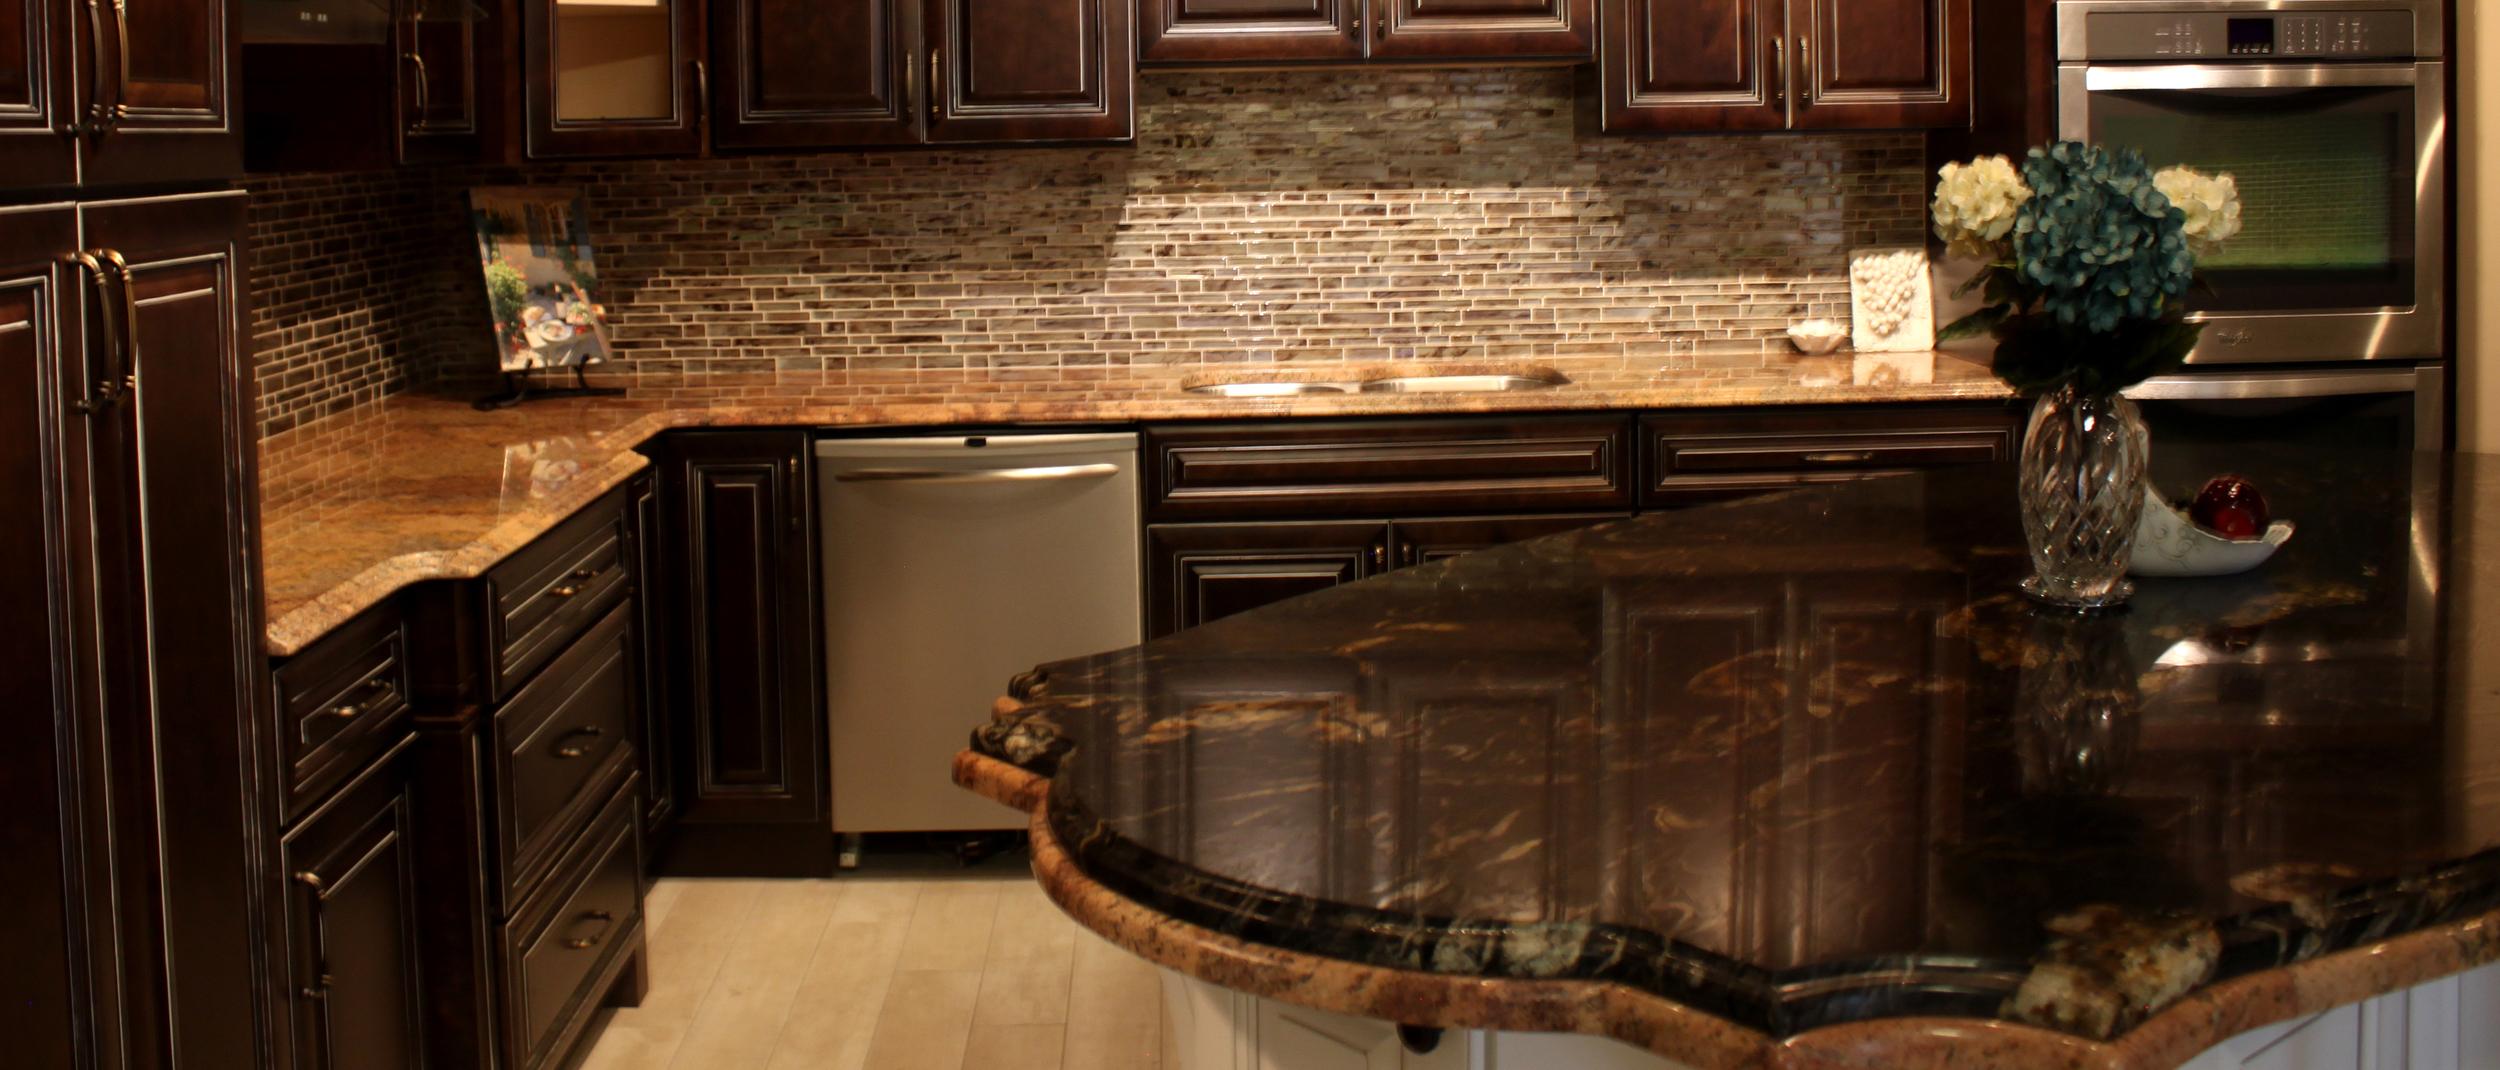 Michigan City Kitchen Cabinets Michigan City Kitchen Cabinetry